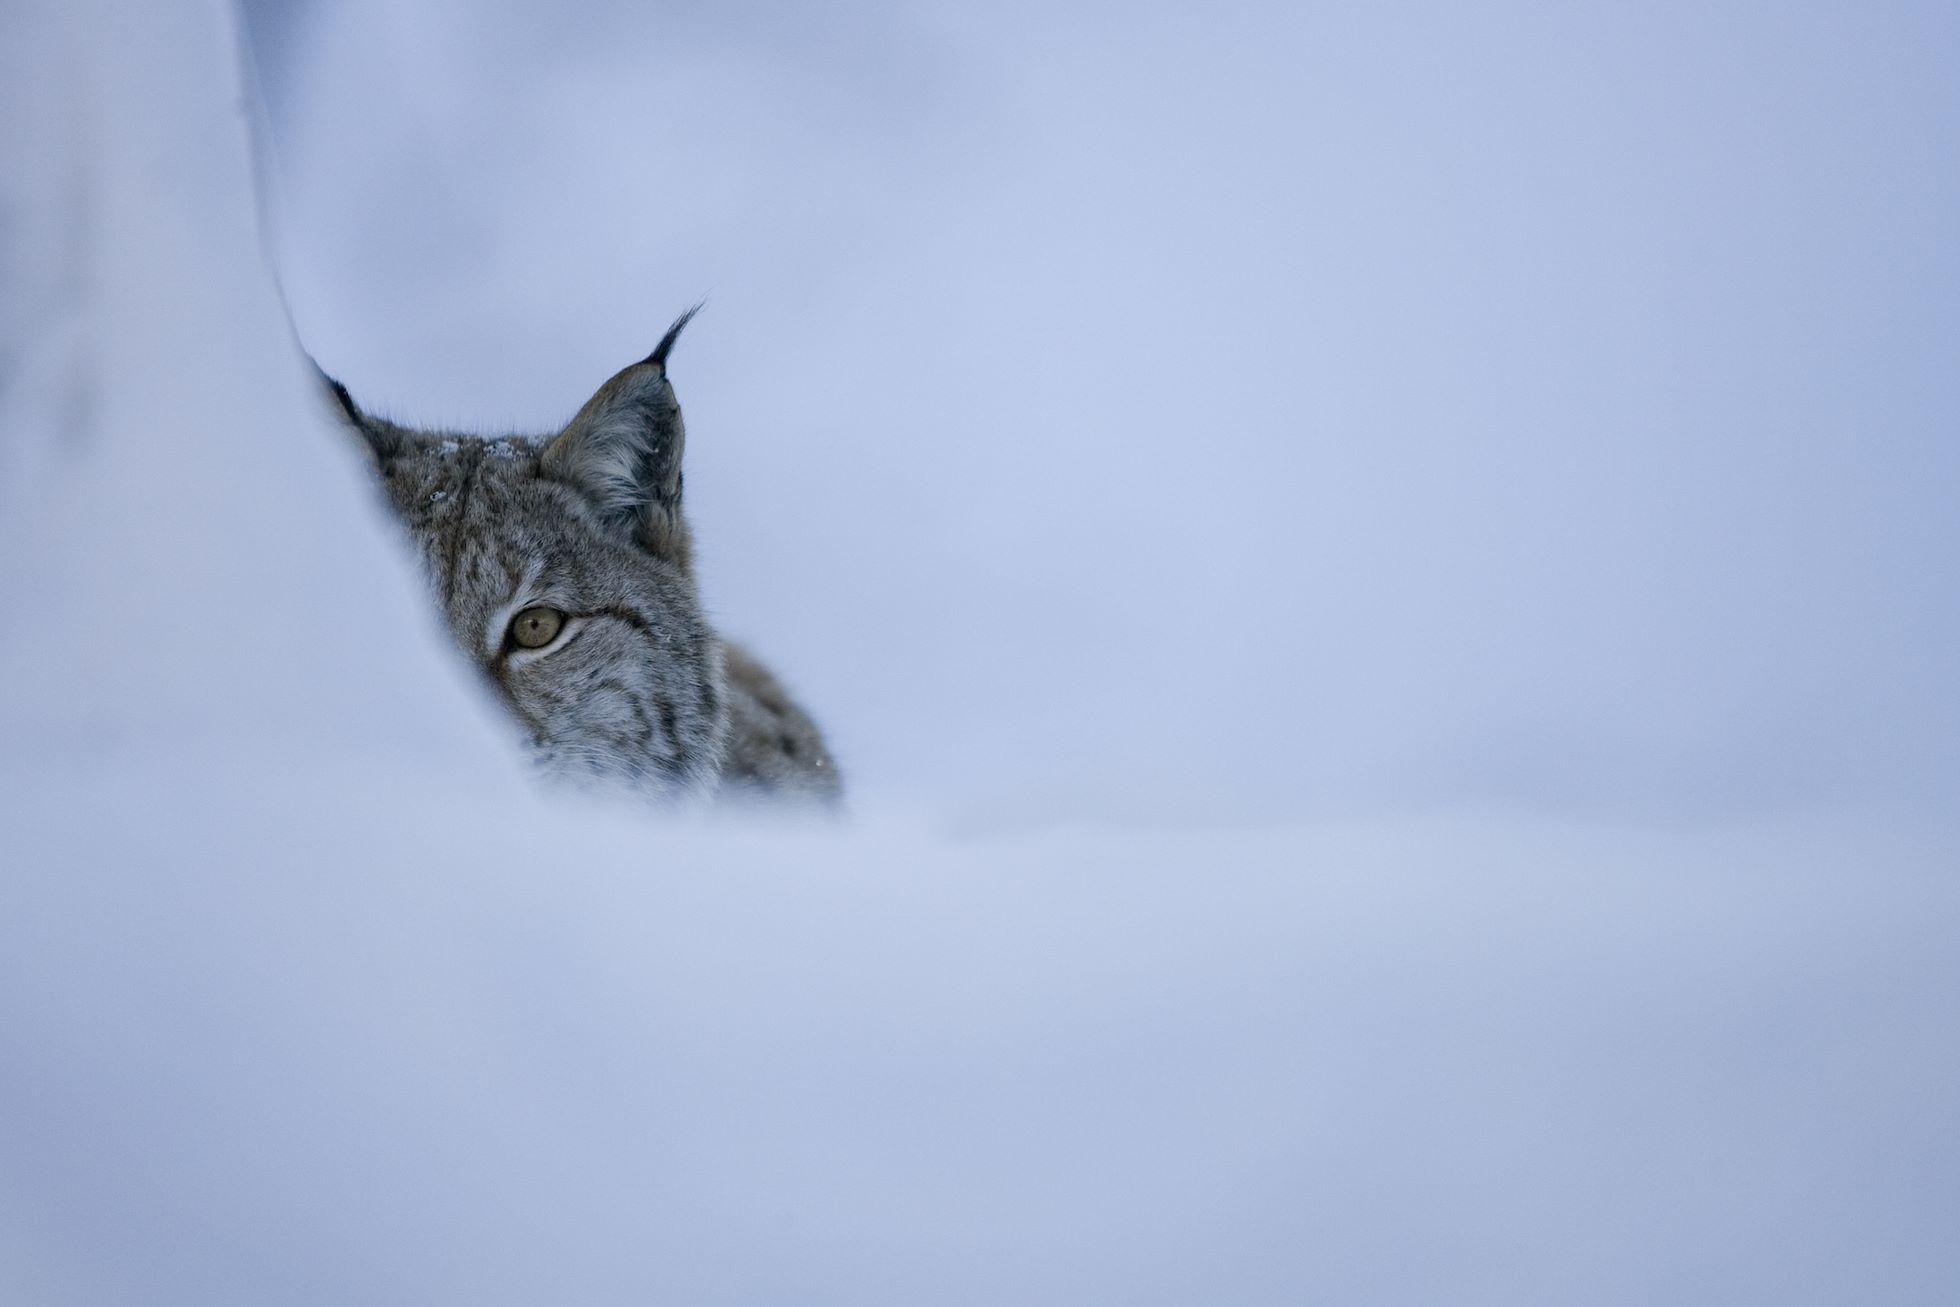 Eurasian lynx (Lynx lynx) in winter birch forest, Norway (c).